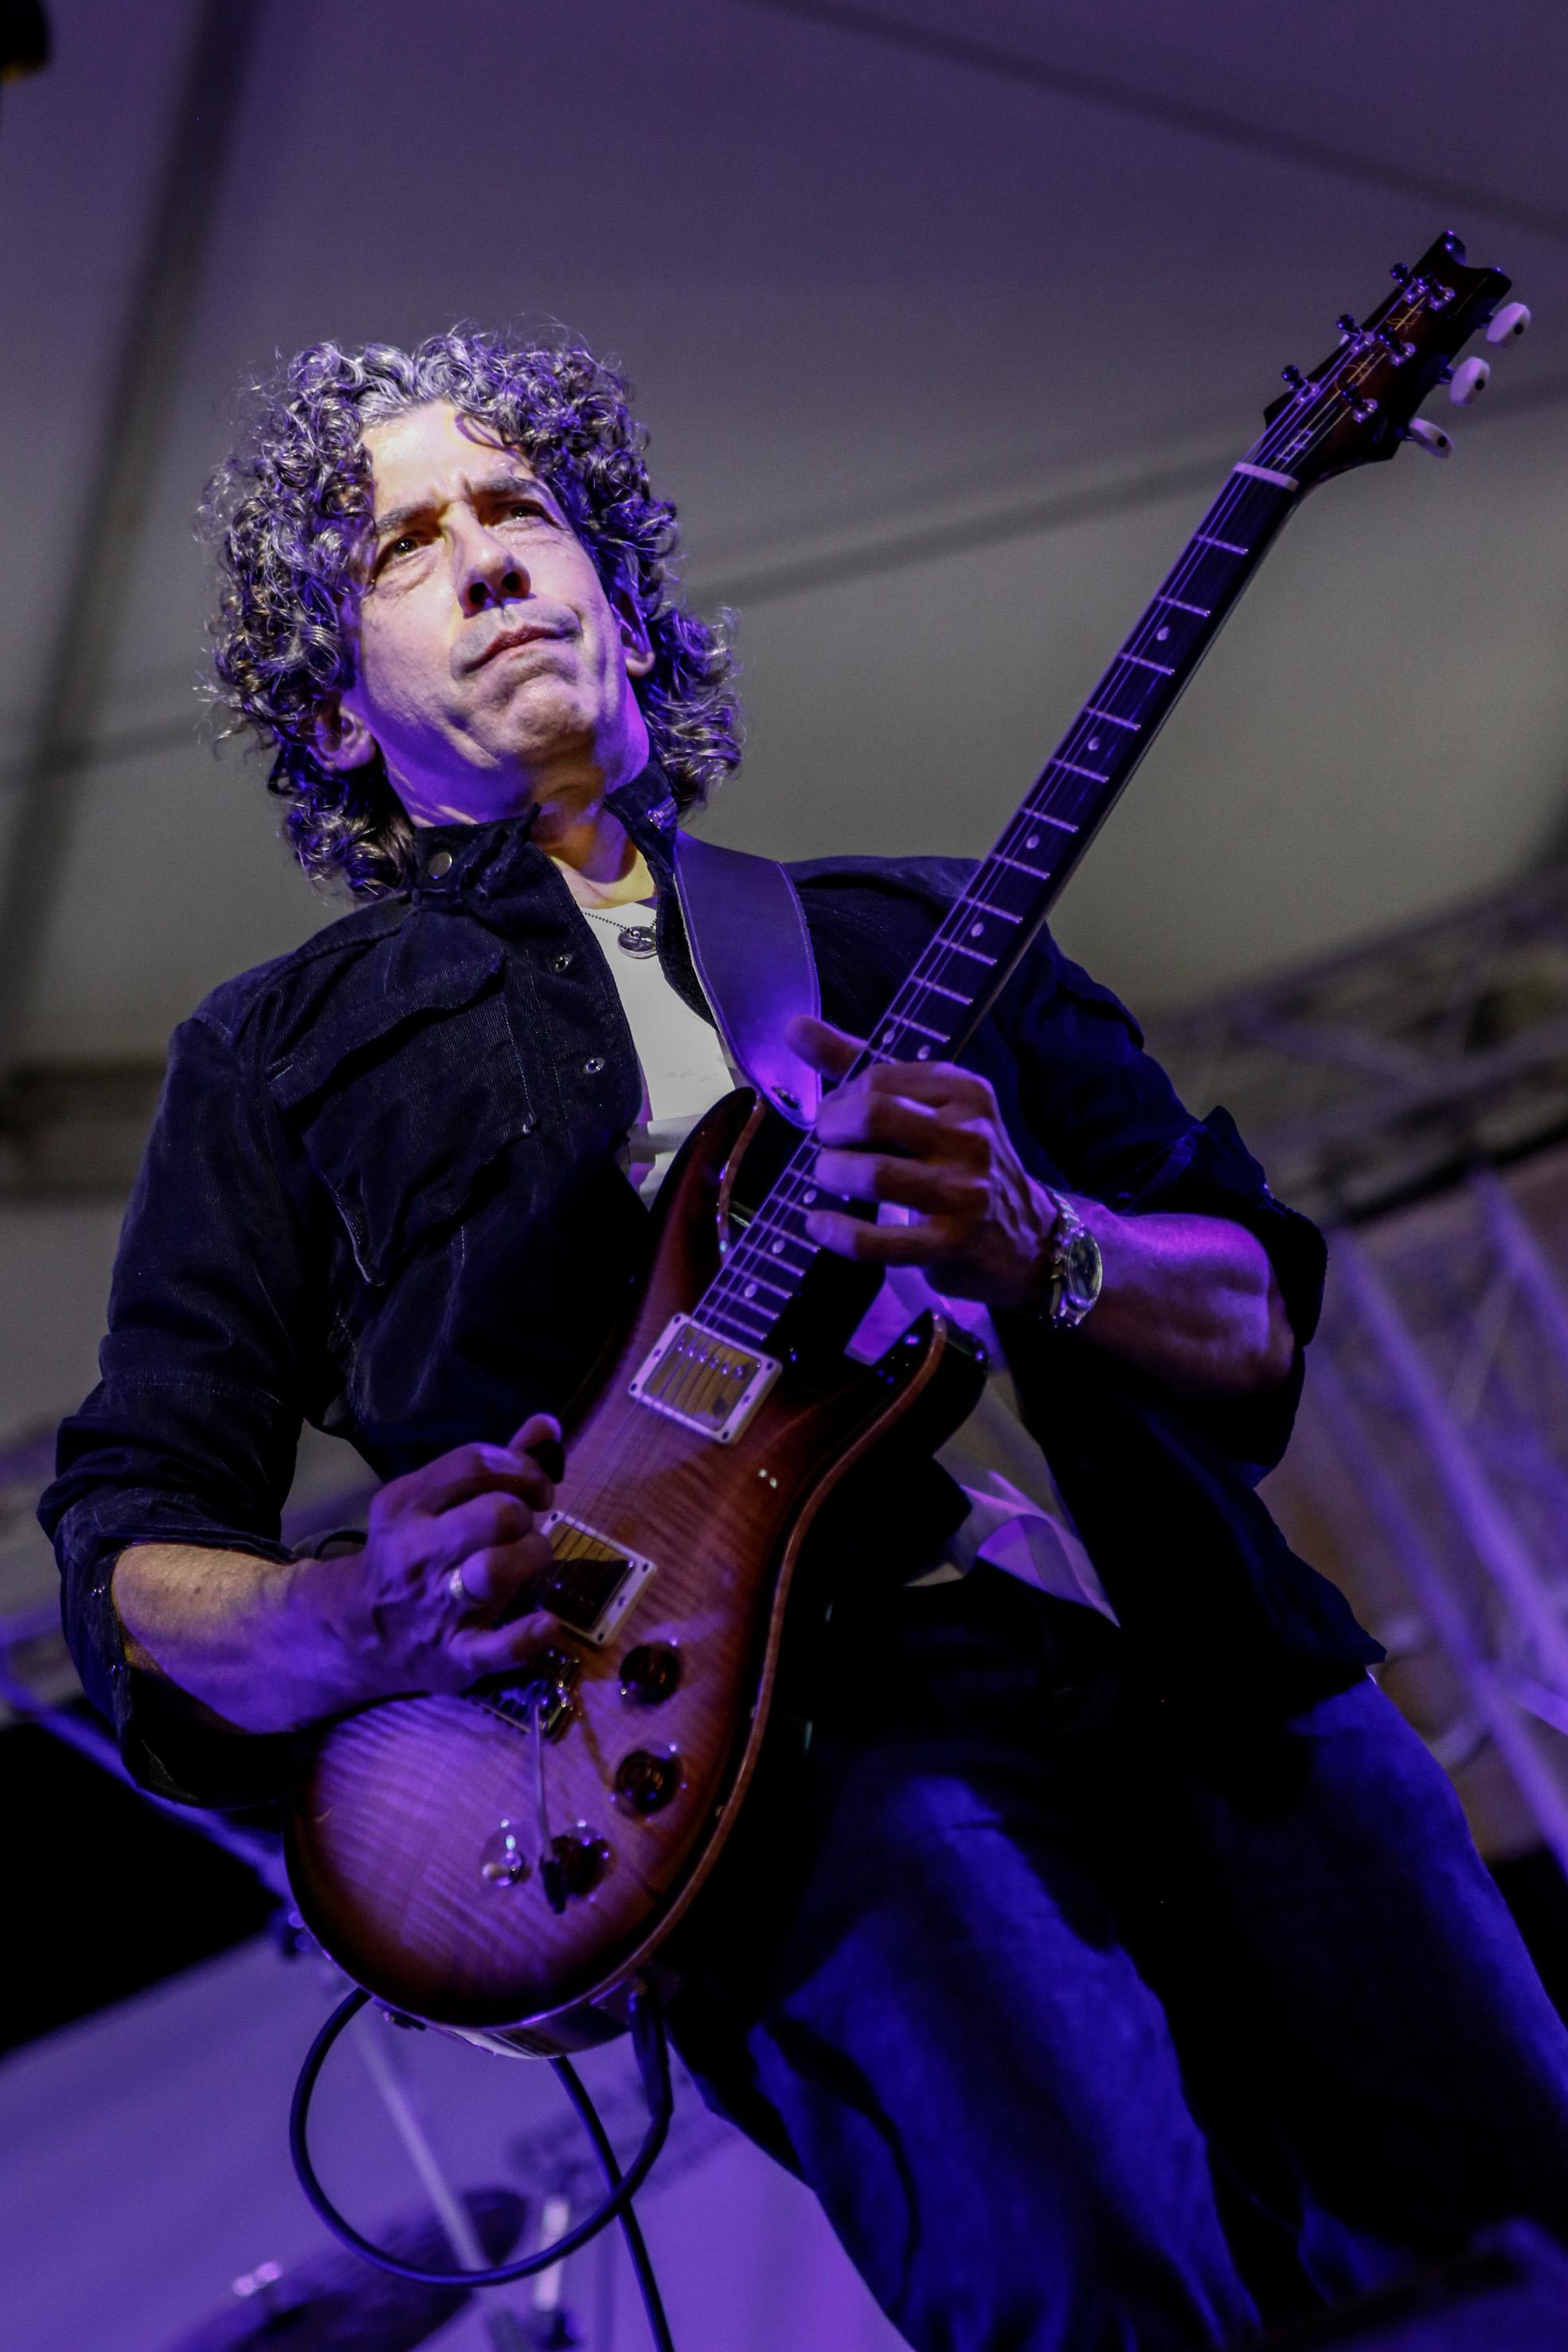 David Grissom – Chiari Blues Festival 2019